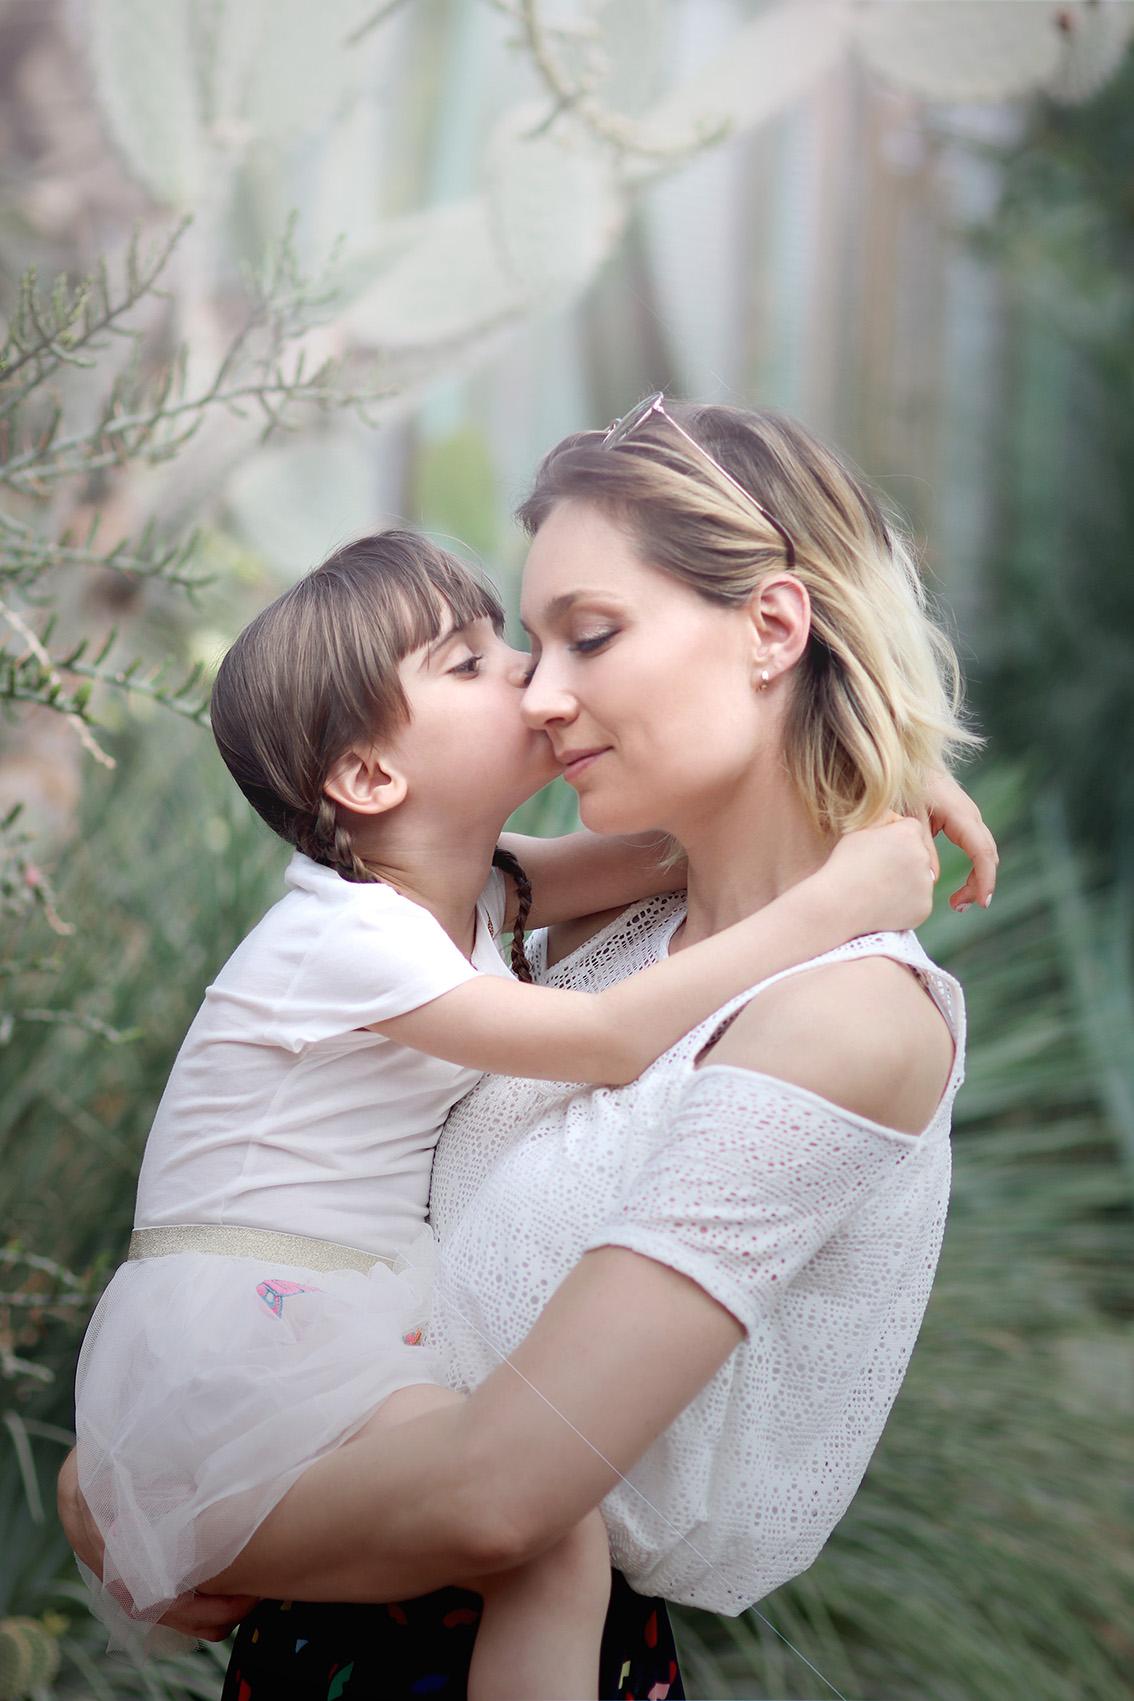 artlex-blogueuse-mode-maman-lyon